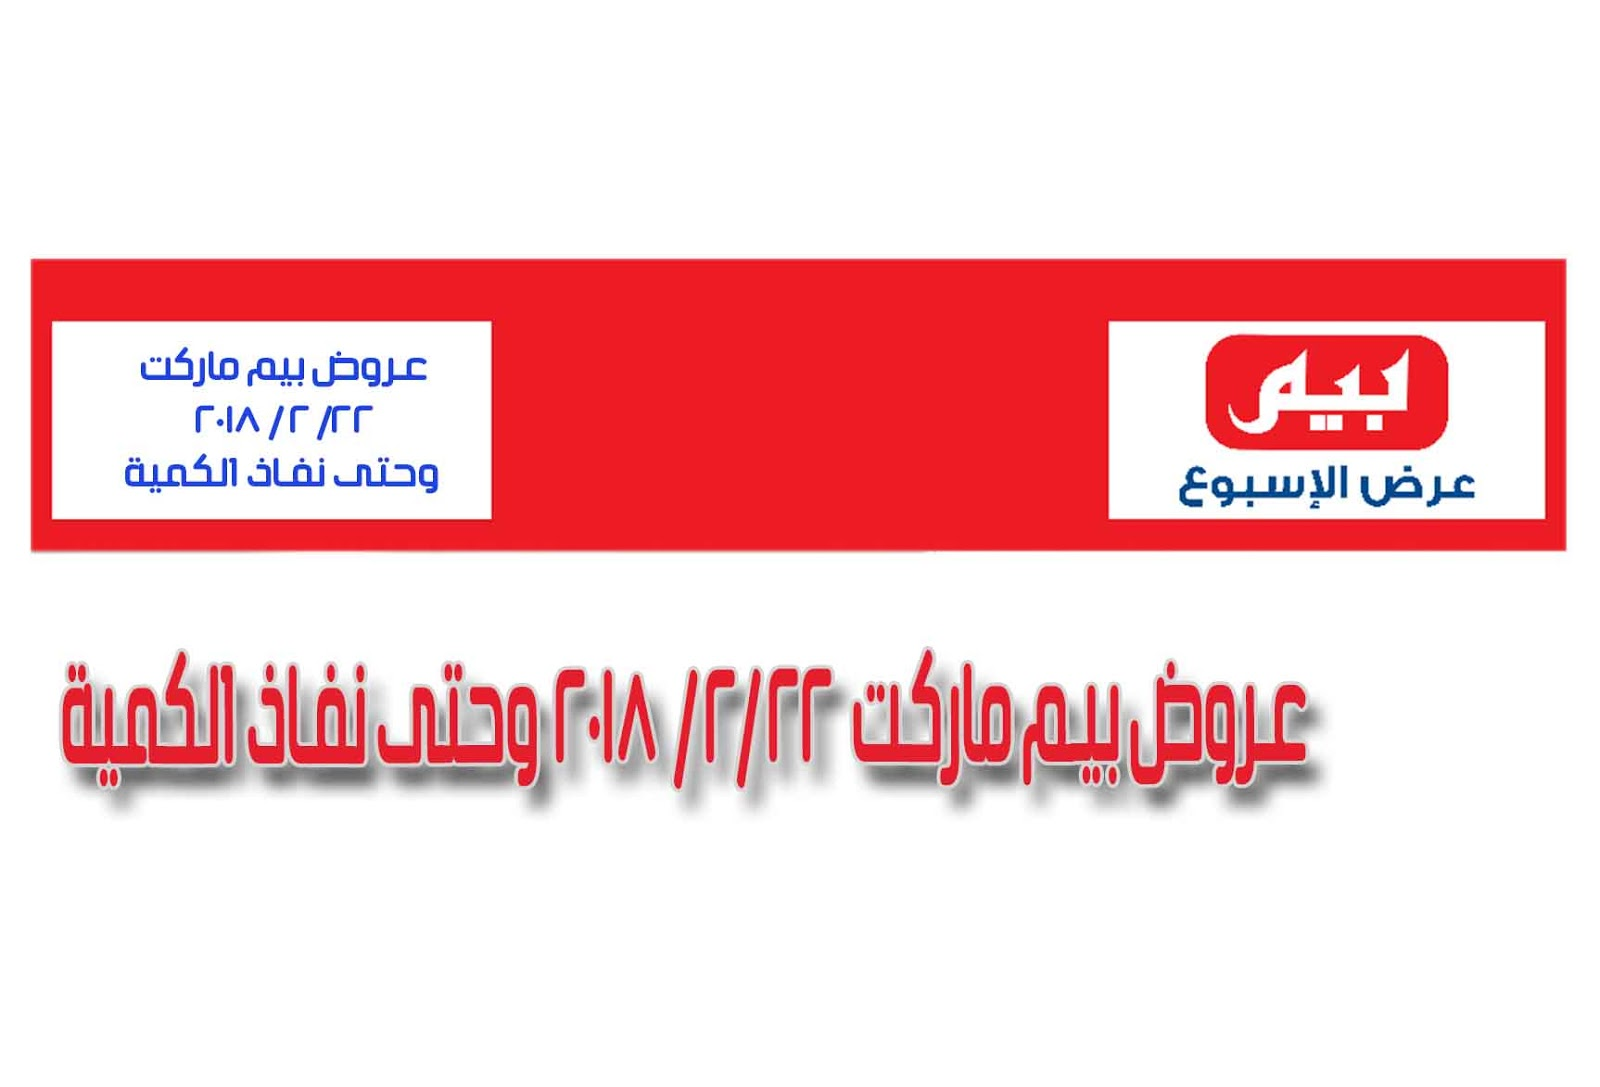 b0d9d5ae9 عروض بيم ماركت الخميس 22 فبراير وحتى نفاذ الكمية | offerz magazine ...